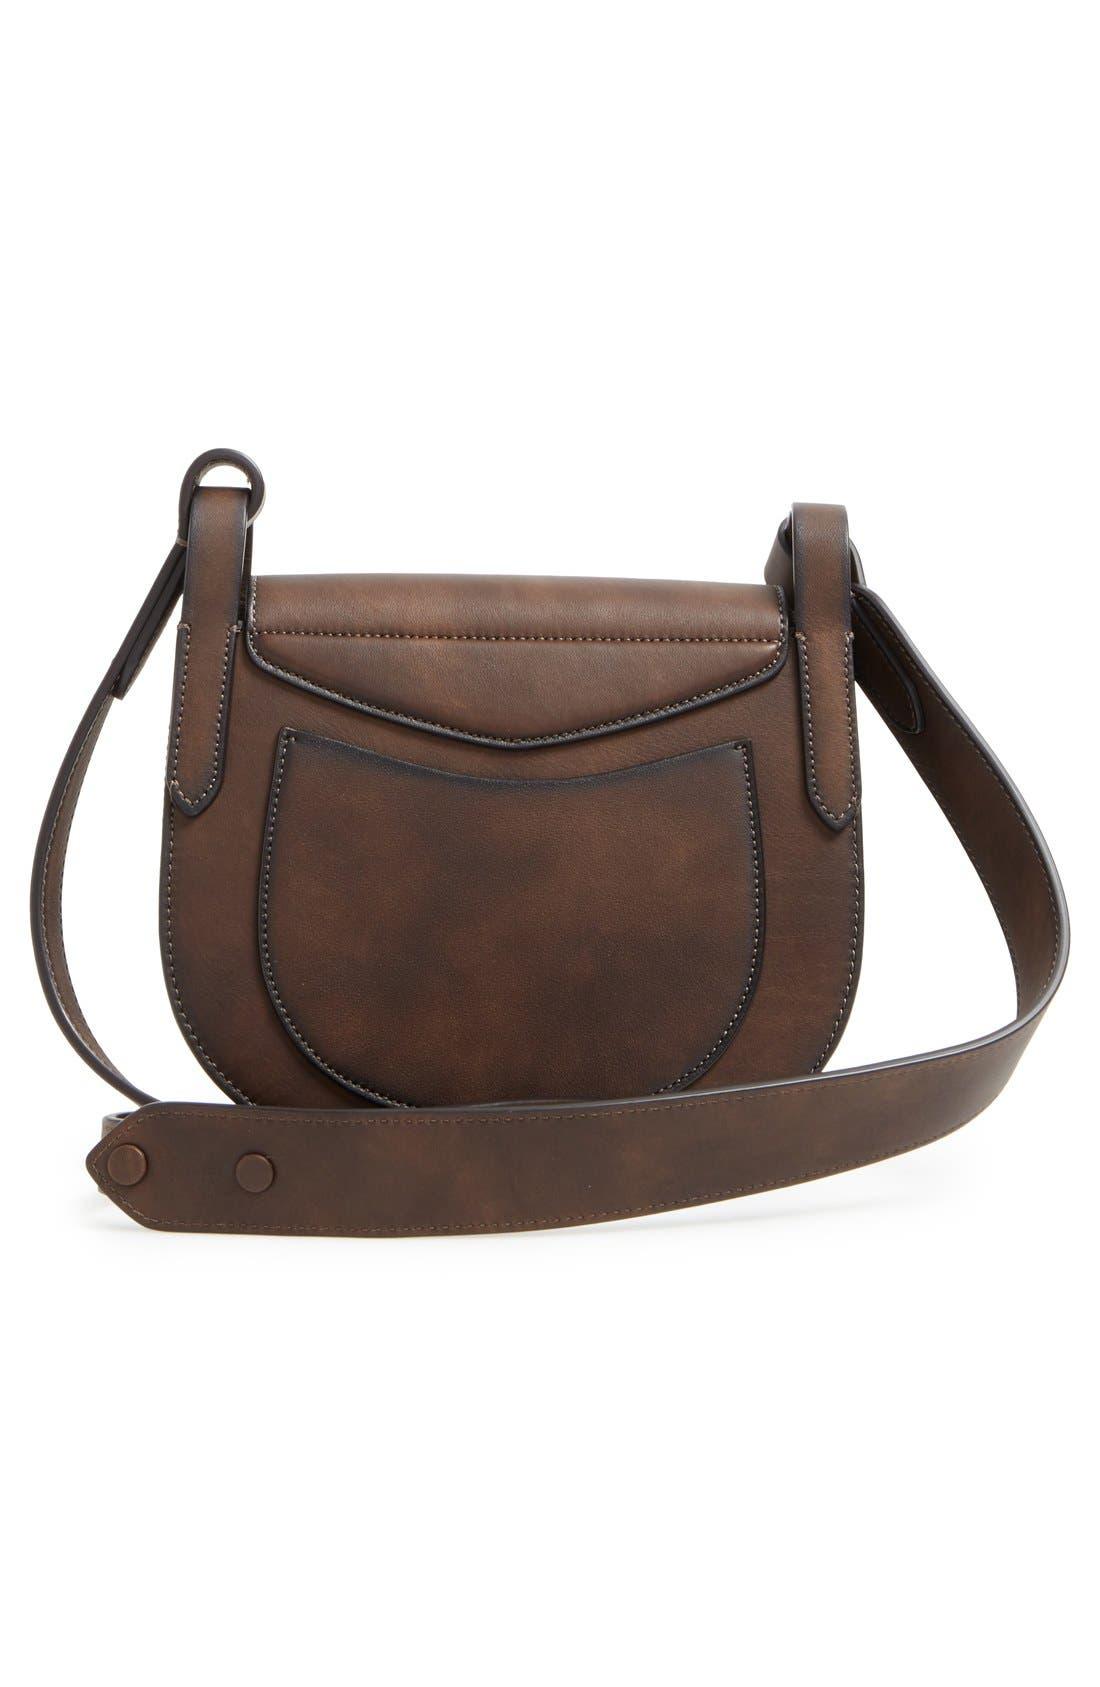 Alternate Image 3  - Michael Kors 'Daria' Leather Saddle Bag